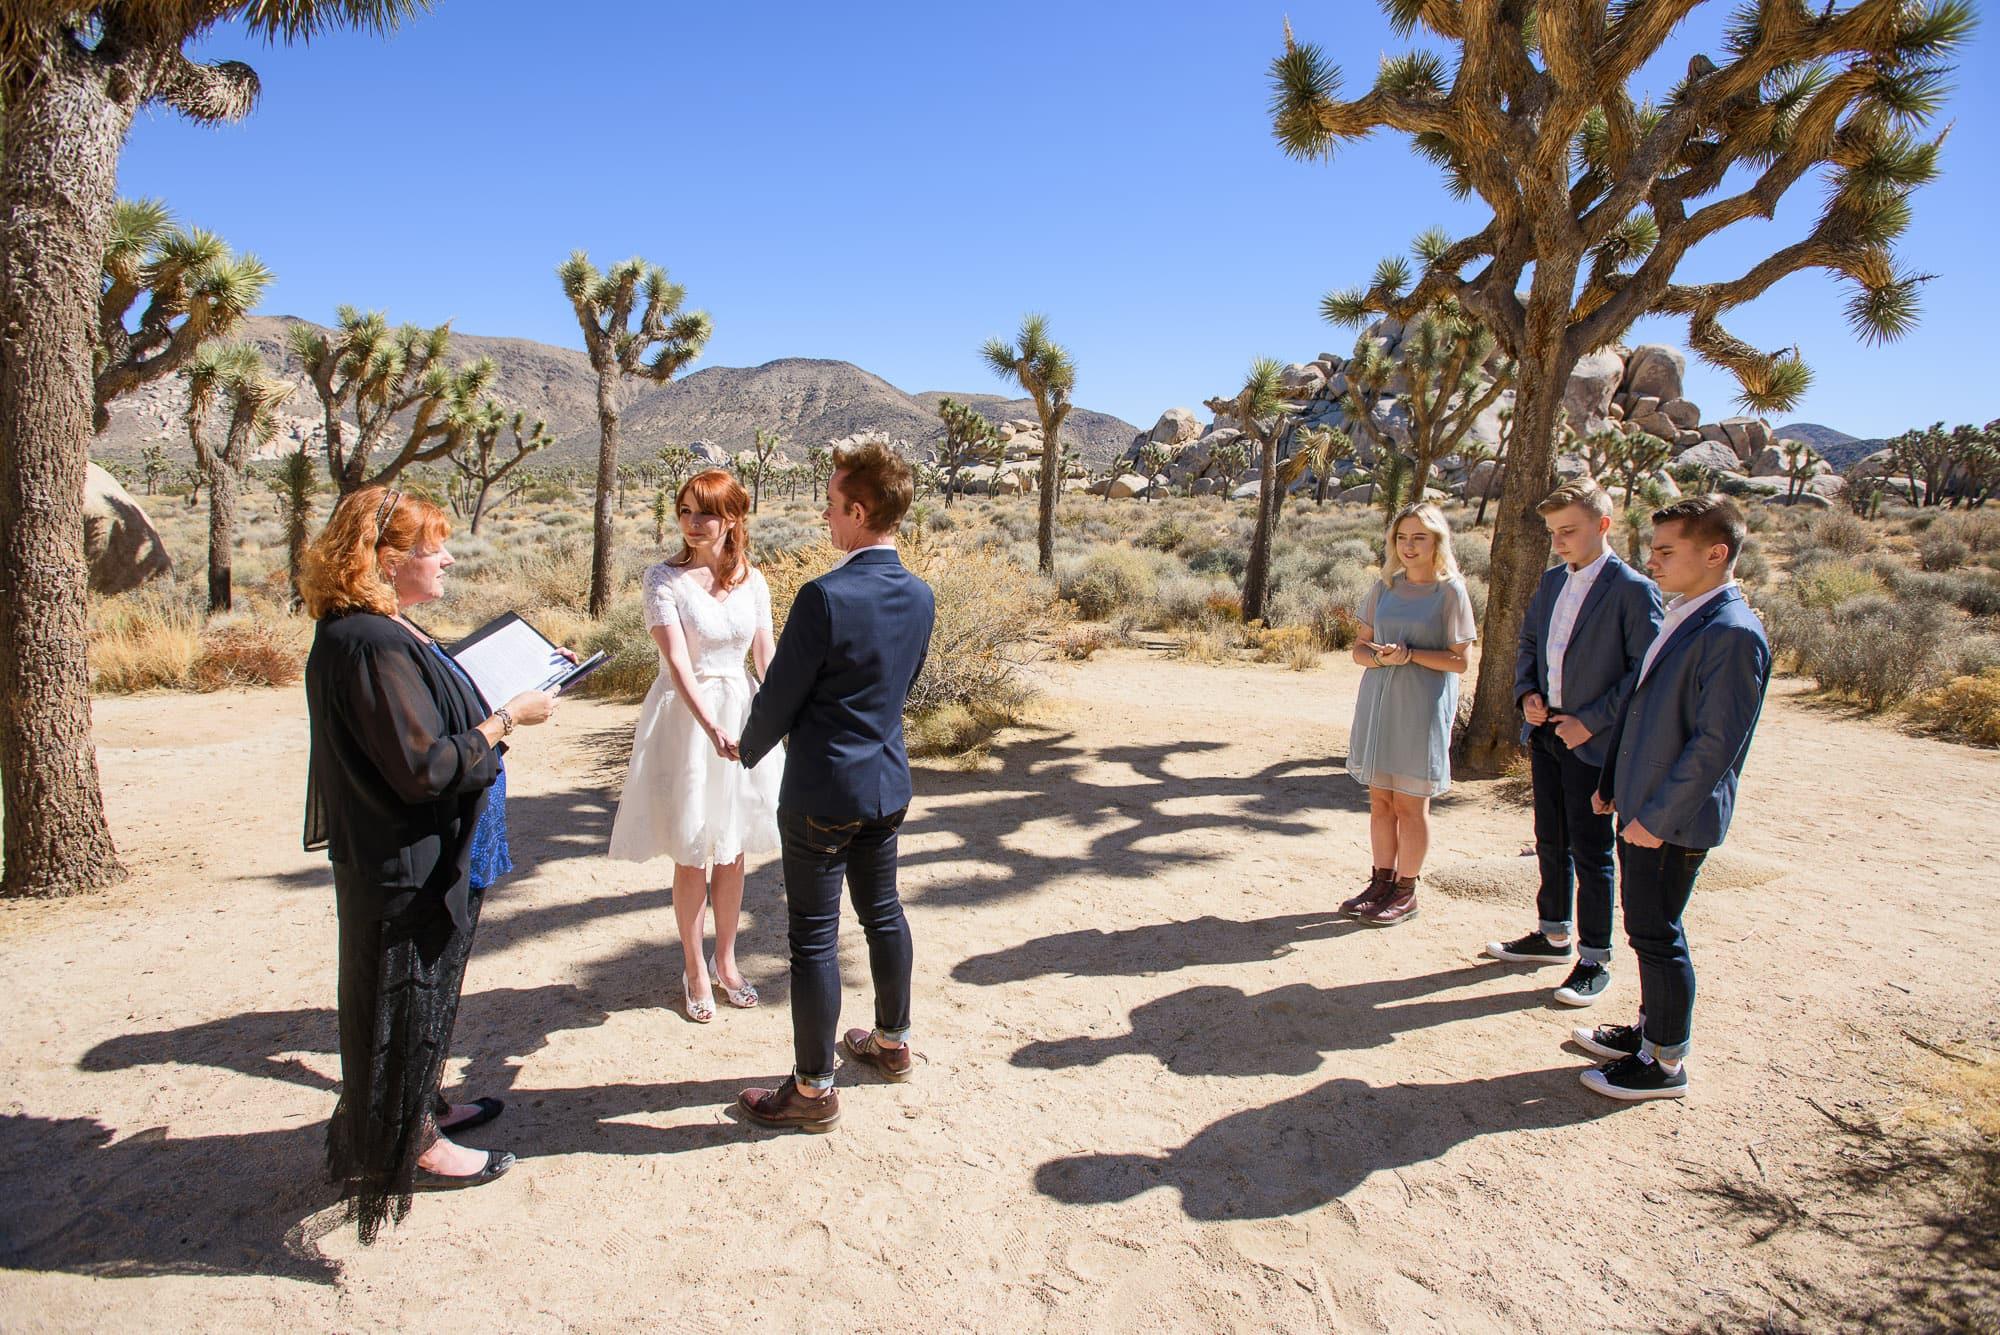 010_Alan_and_Heidi_Joshua_Tree_Destination_Wedding